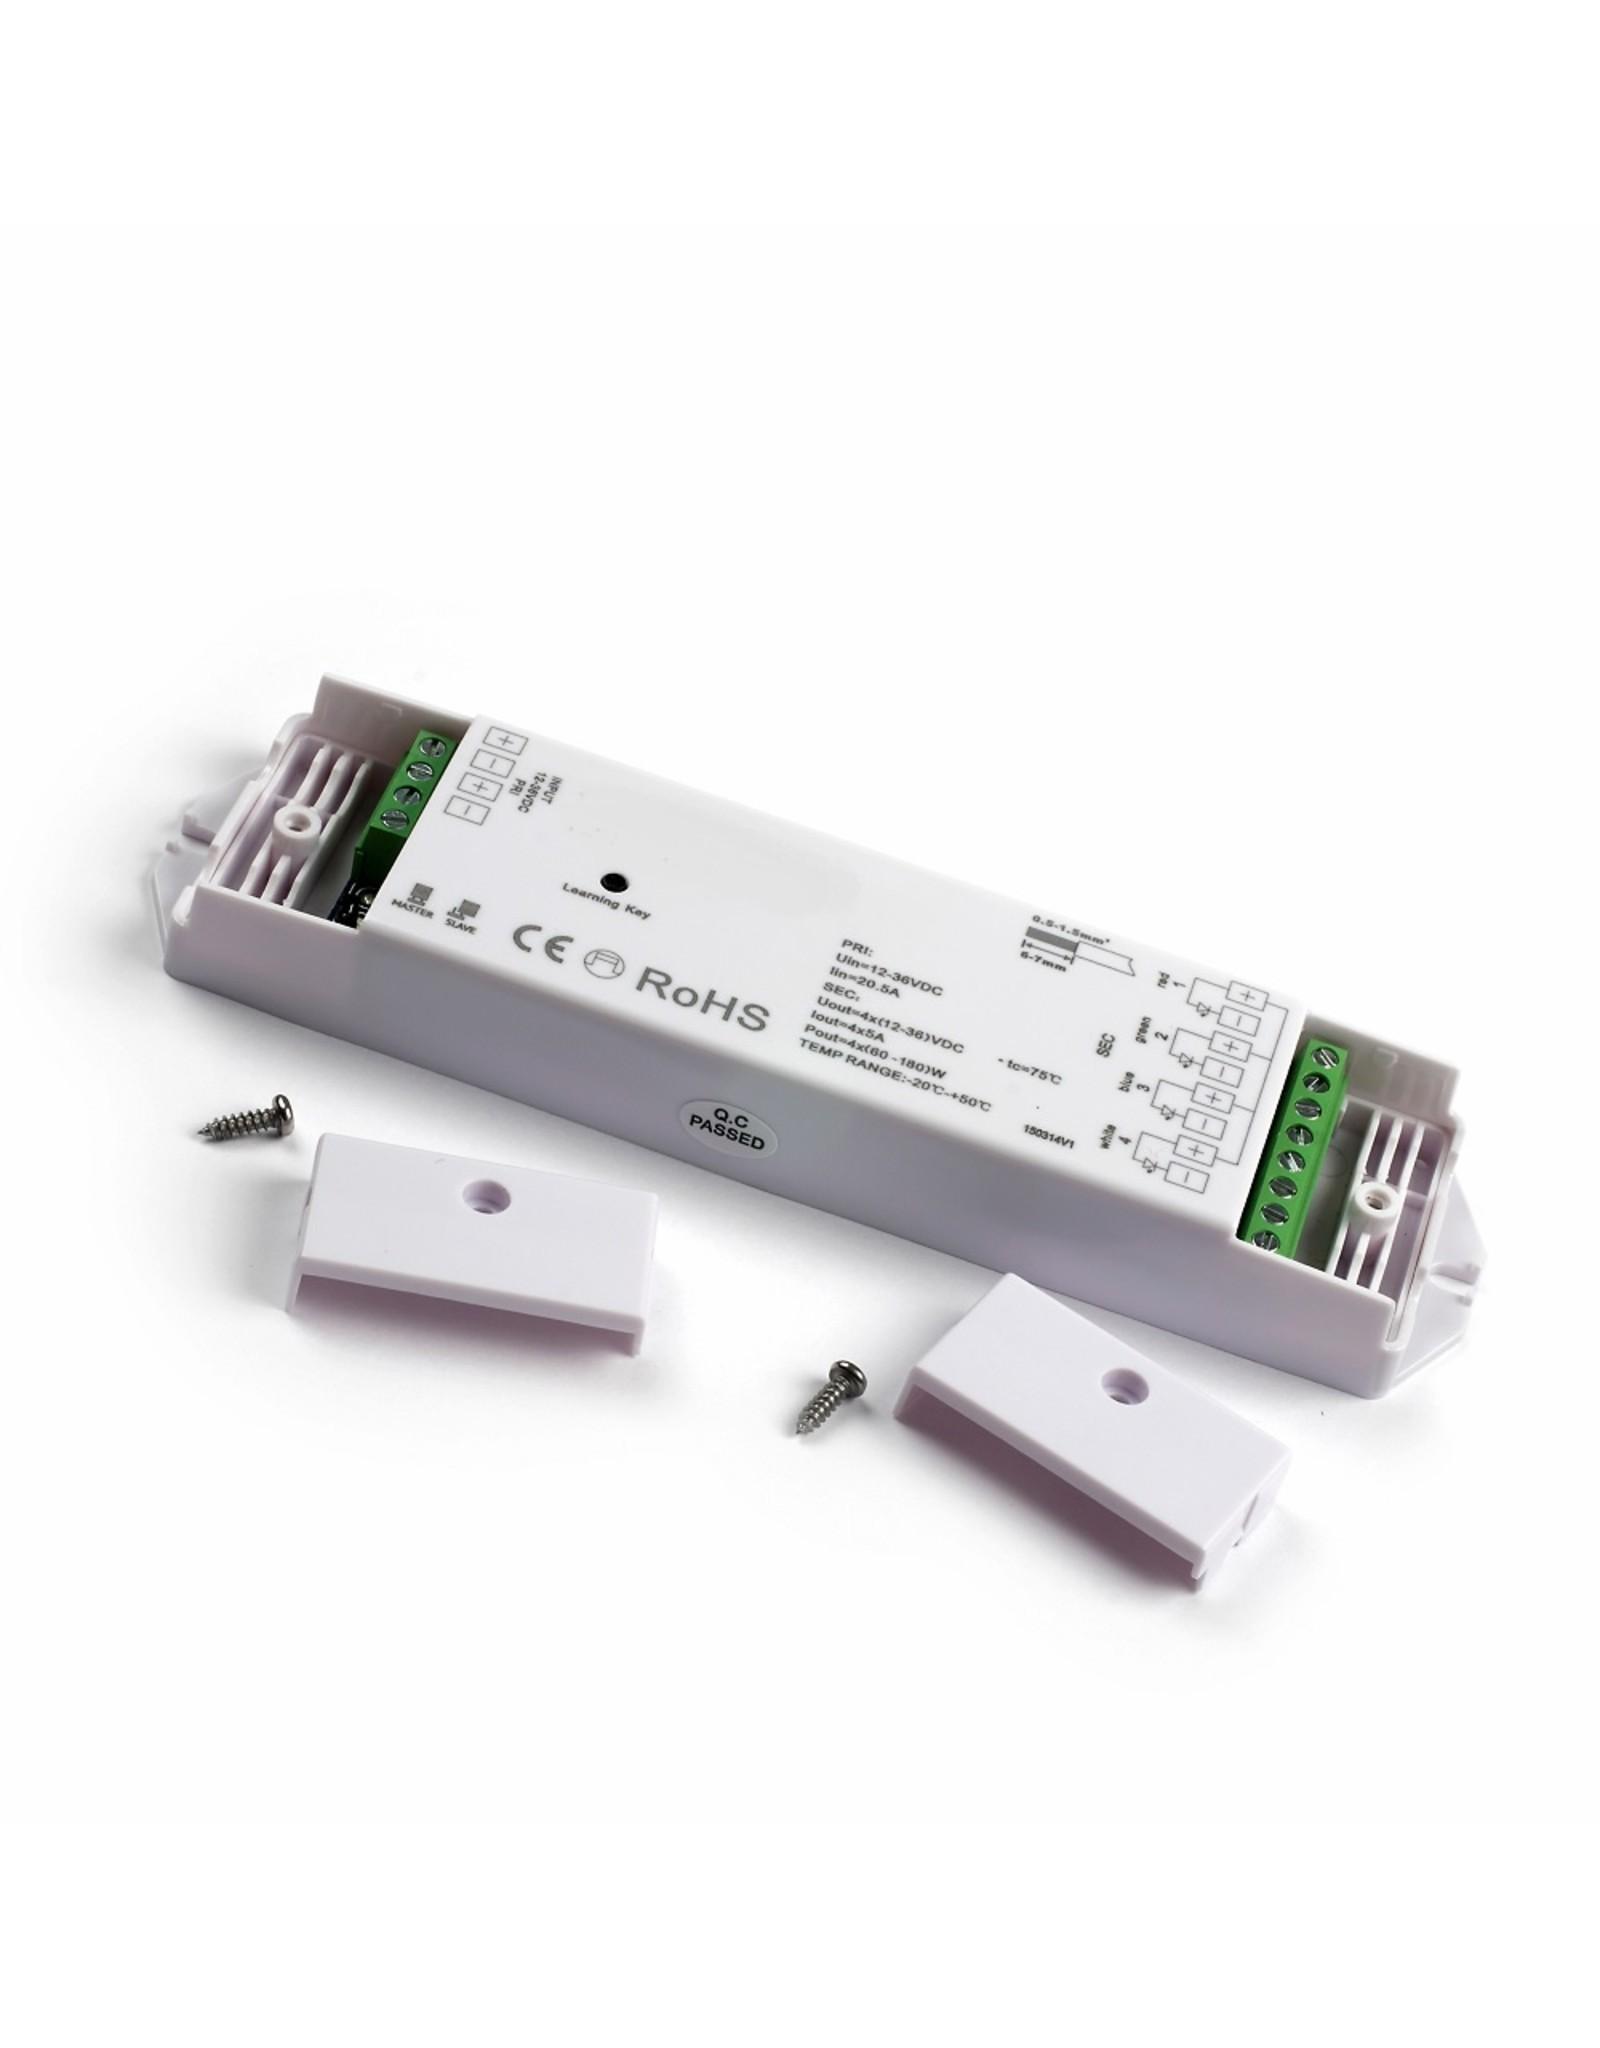 LedLed Led Dim unit 4x700ma t.b.v. afstandsbedieningen.